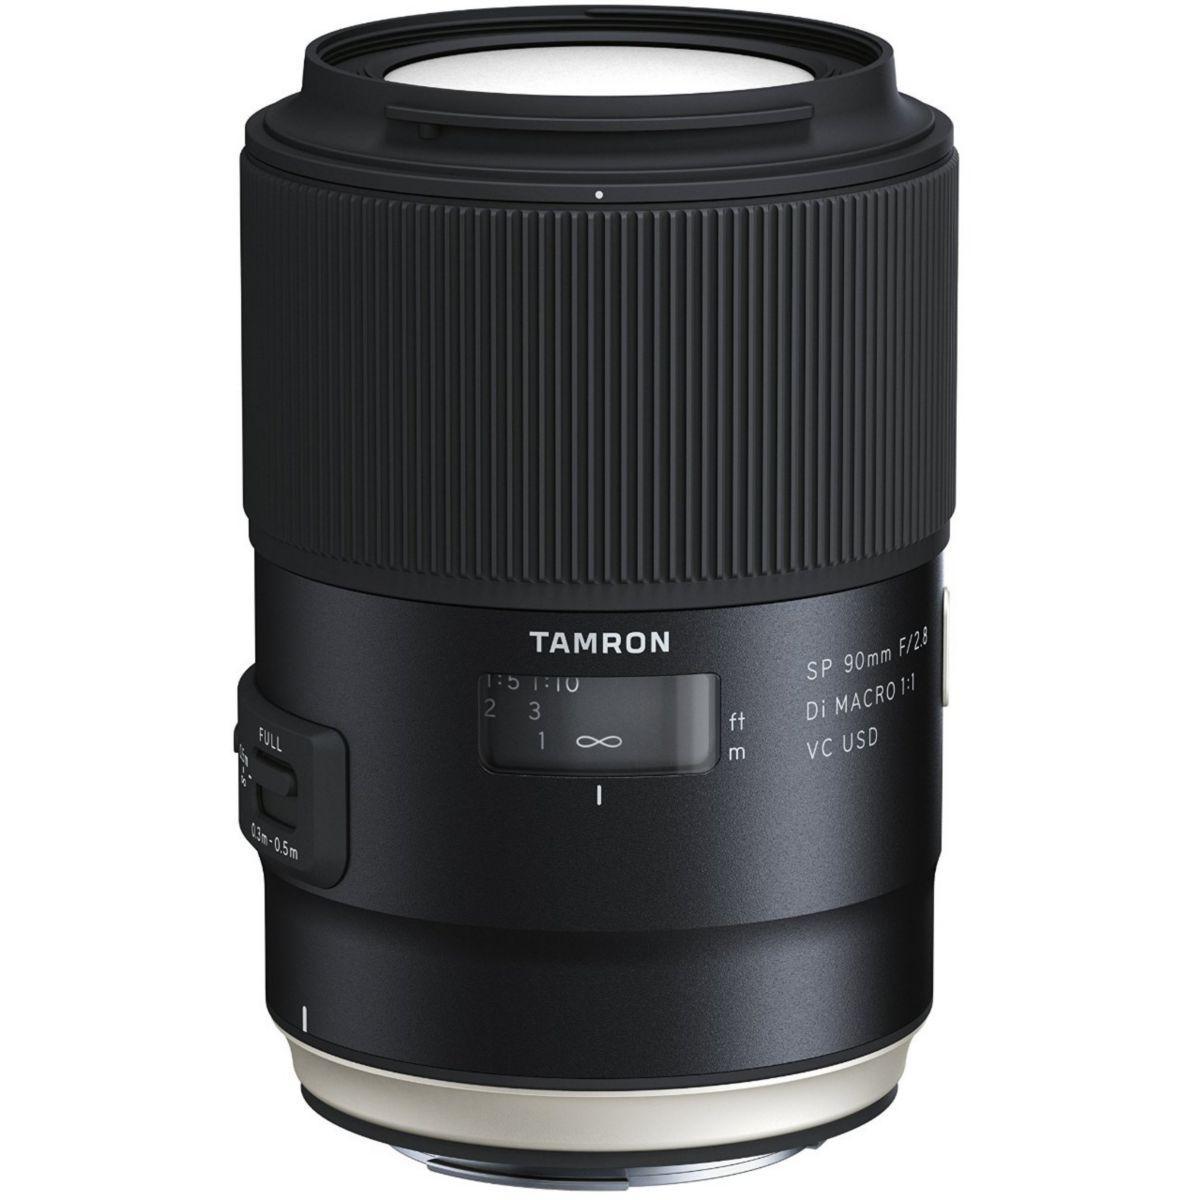 Objectif tamron sp 90mm f/2.8 di vc usd canon